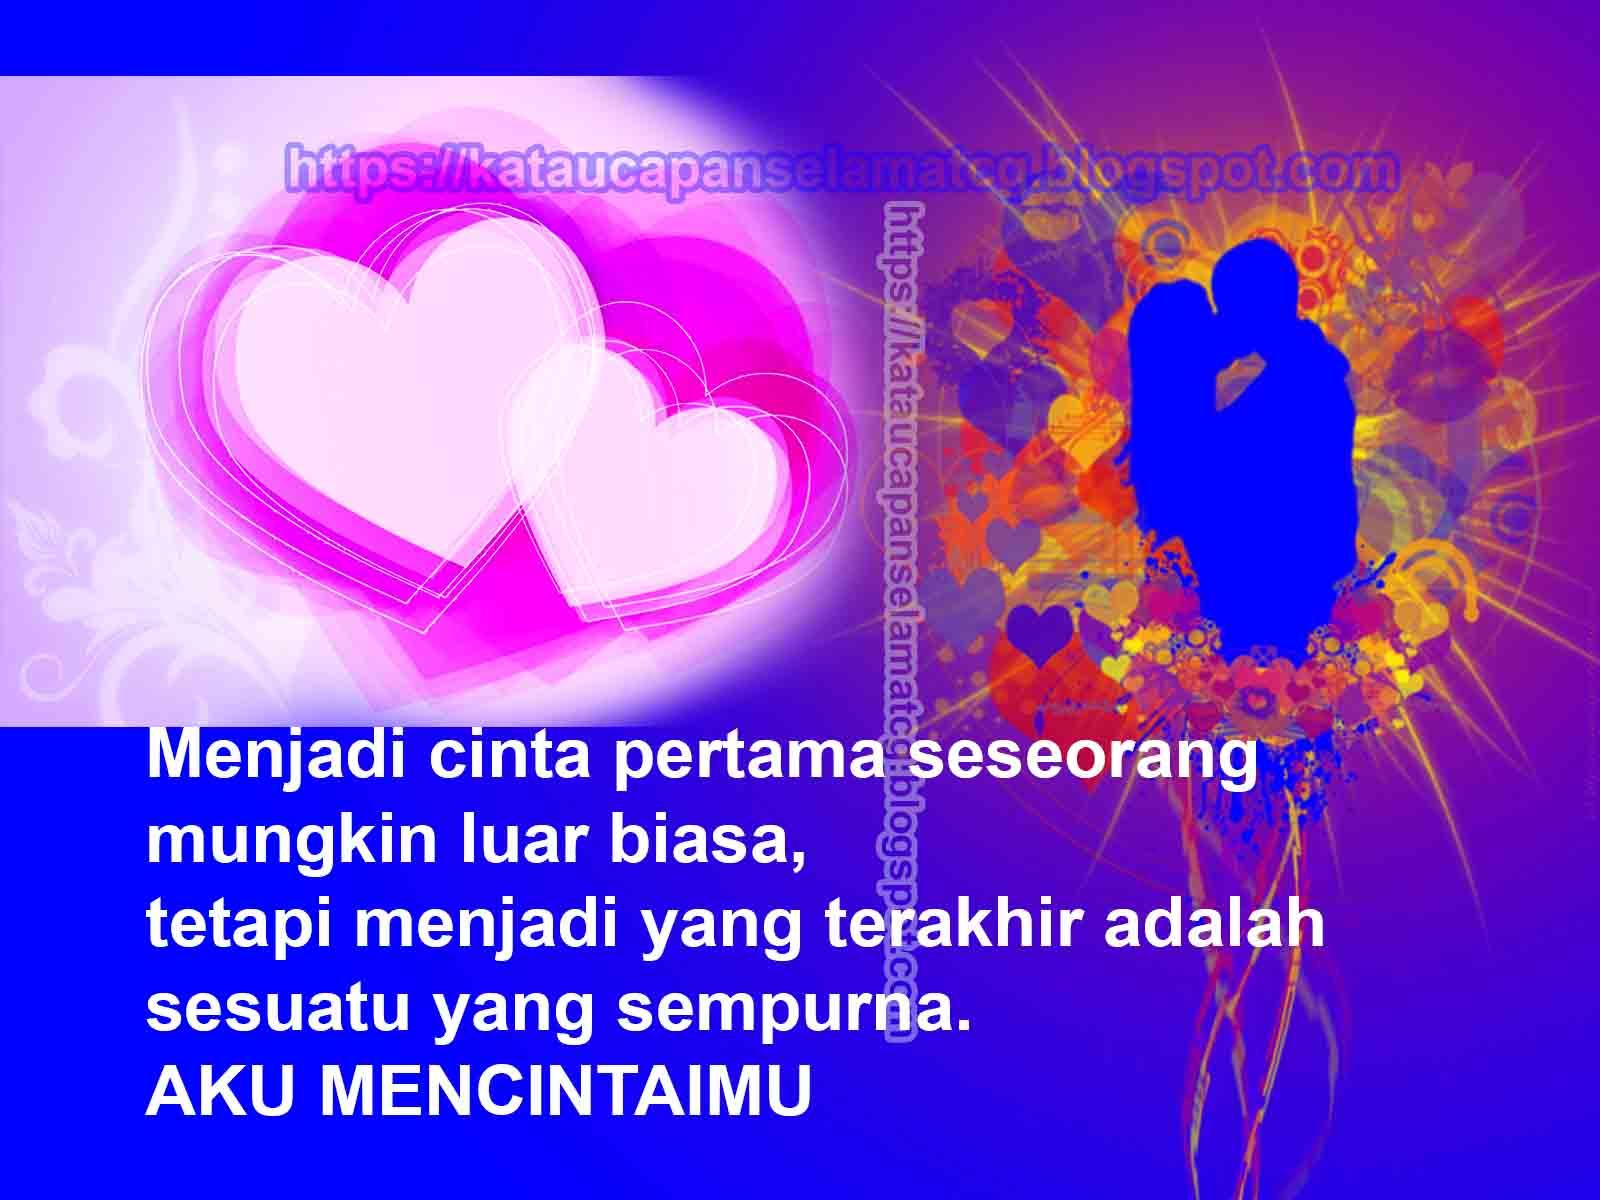 80 Ucapan Valentine Dan Kata Kata Cinta Untuk Suami Kata Ucapan Selamat Terbaru